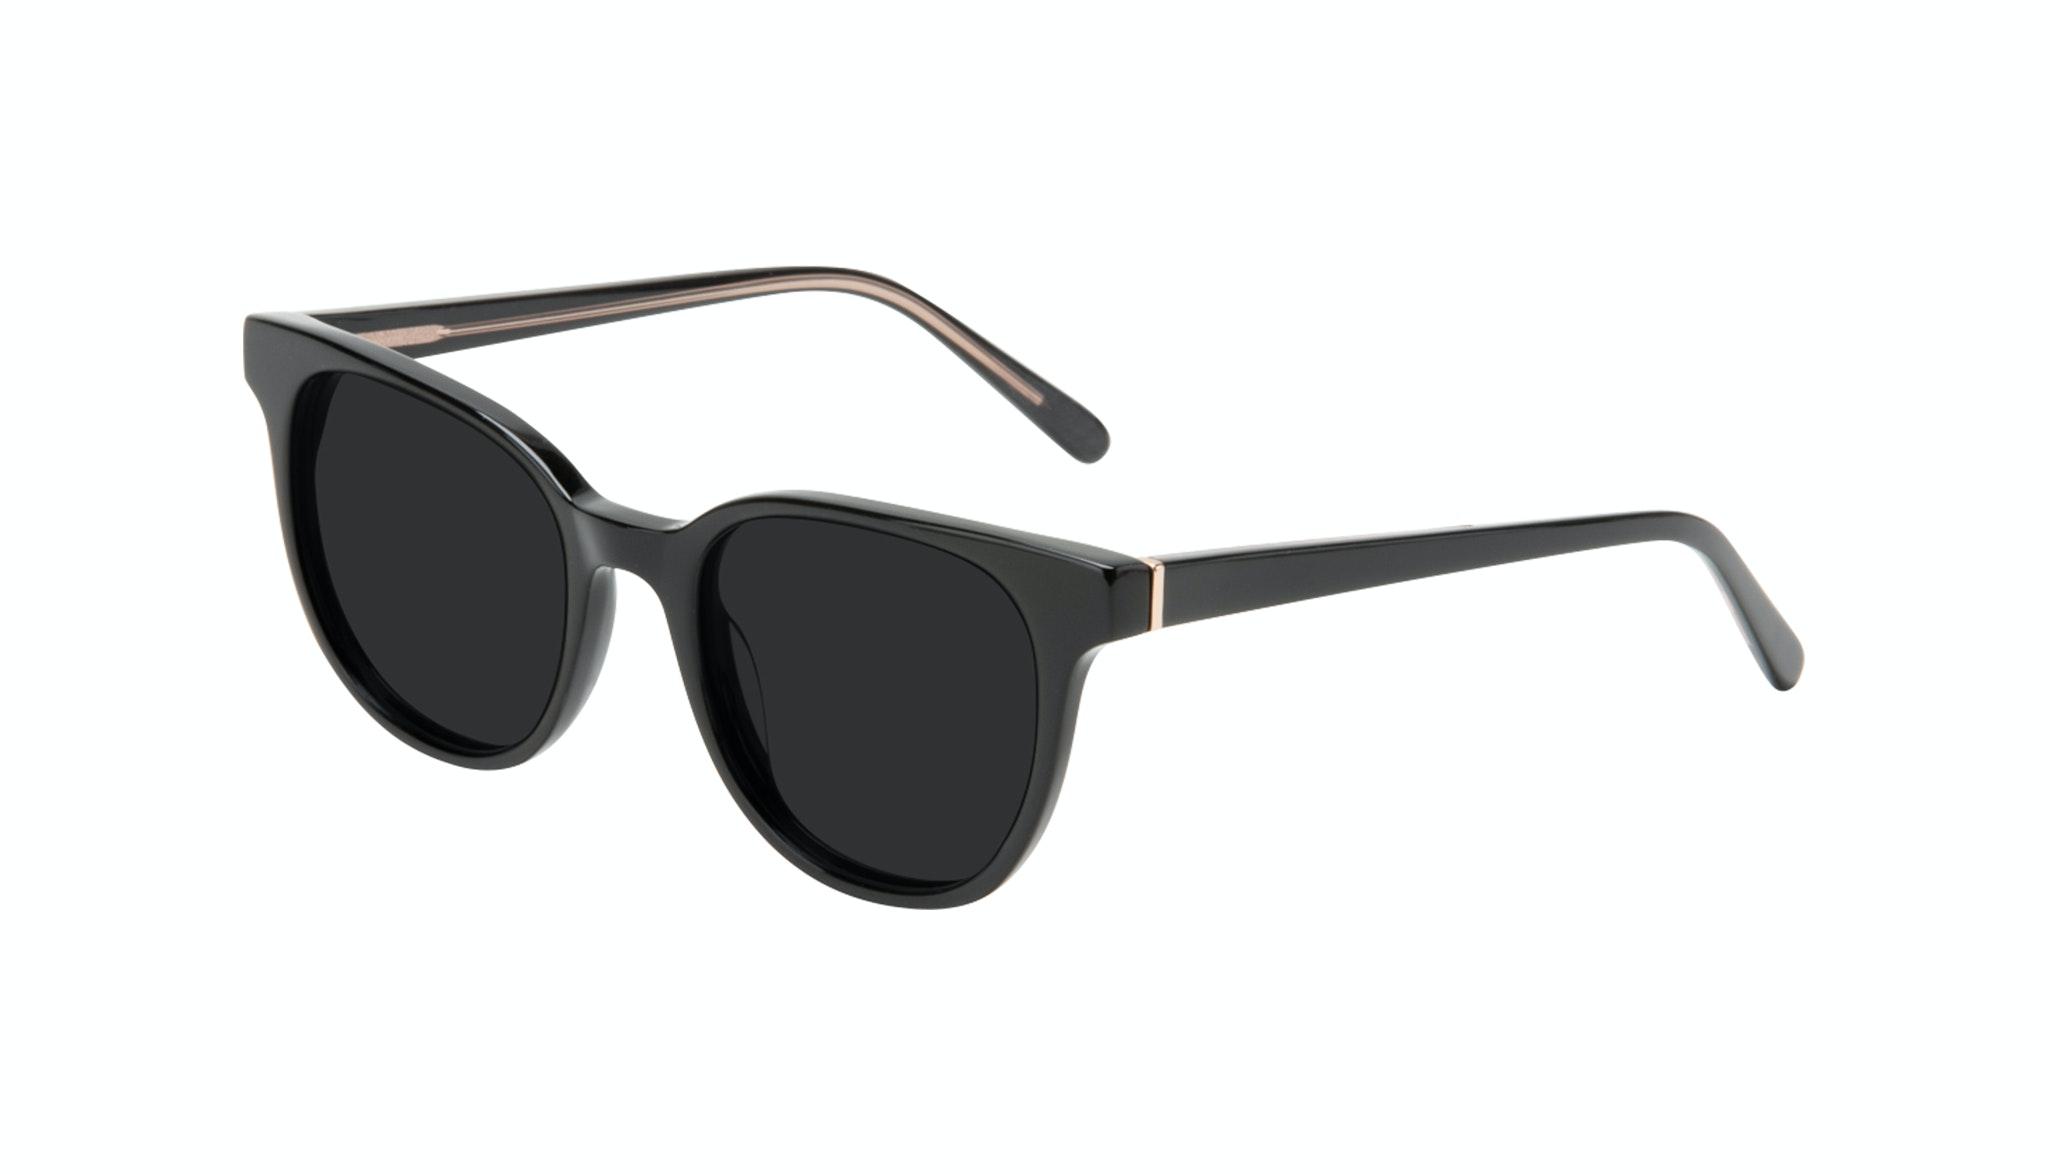 Affordable Fashion Glasses Square Sunglasses Women Lively Black Tilt